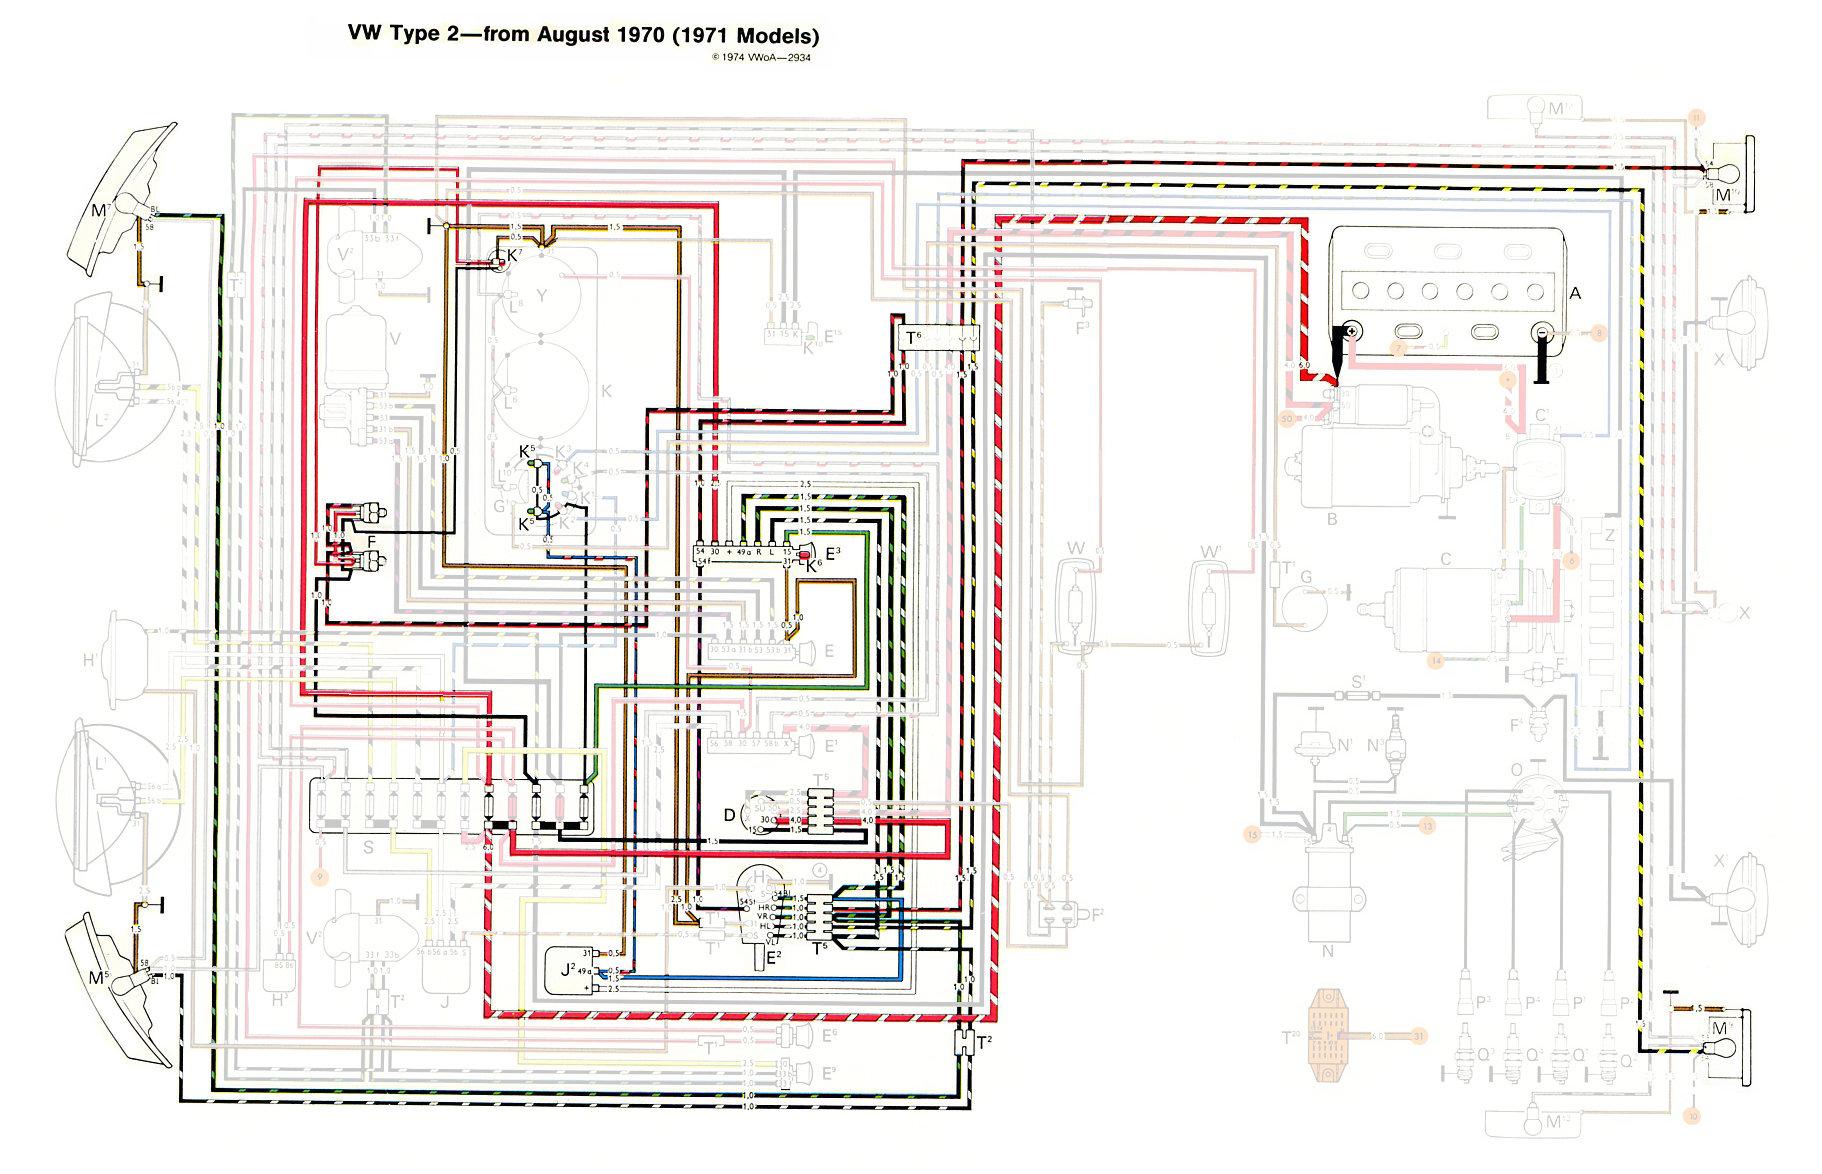 Bus fuse diagram wiring diagrams on vw wiring diagram Mini Cooper Wiring Diagrams Alfa Romeo Wiring Diagrams